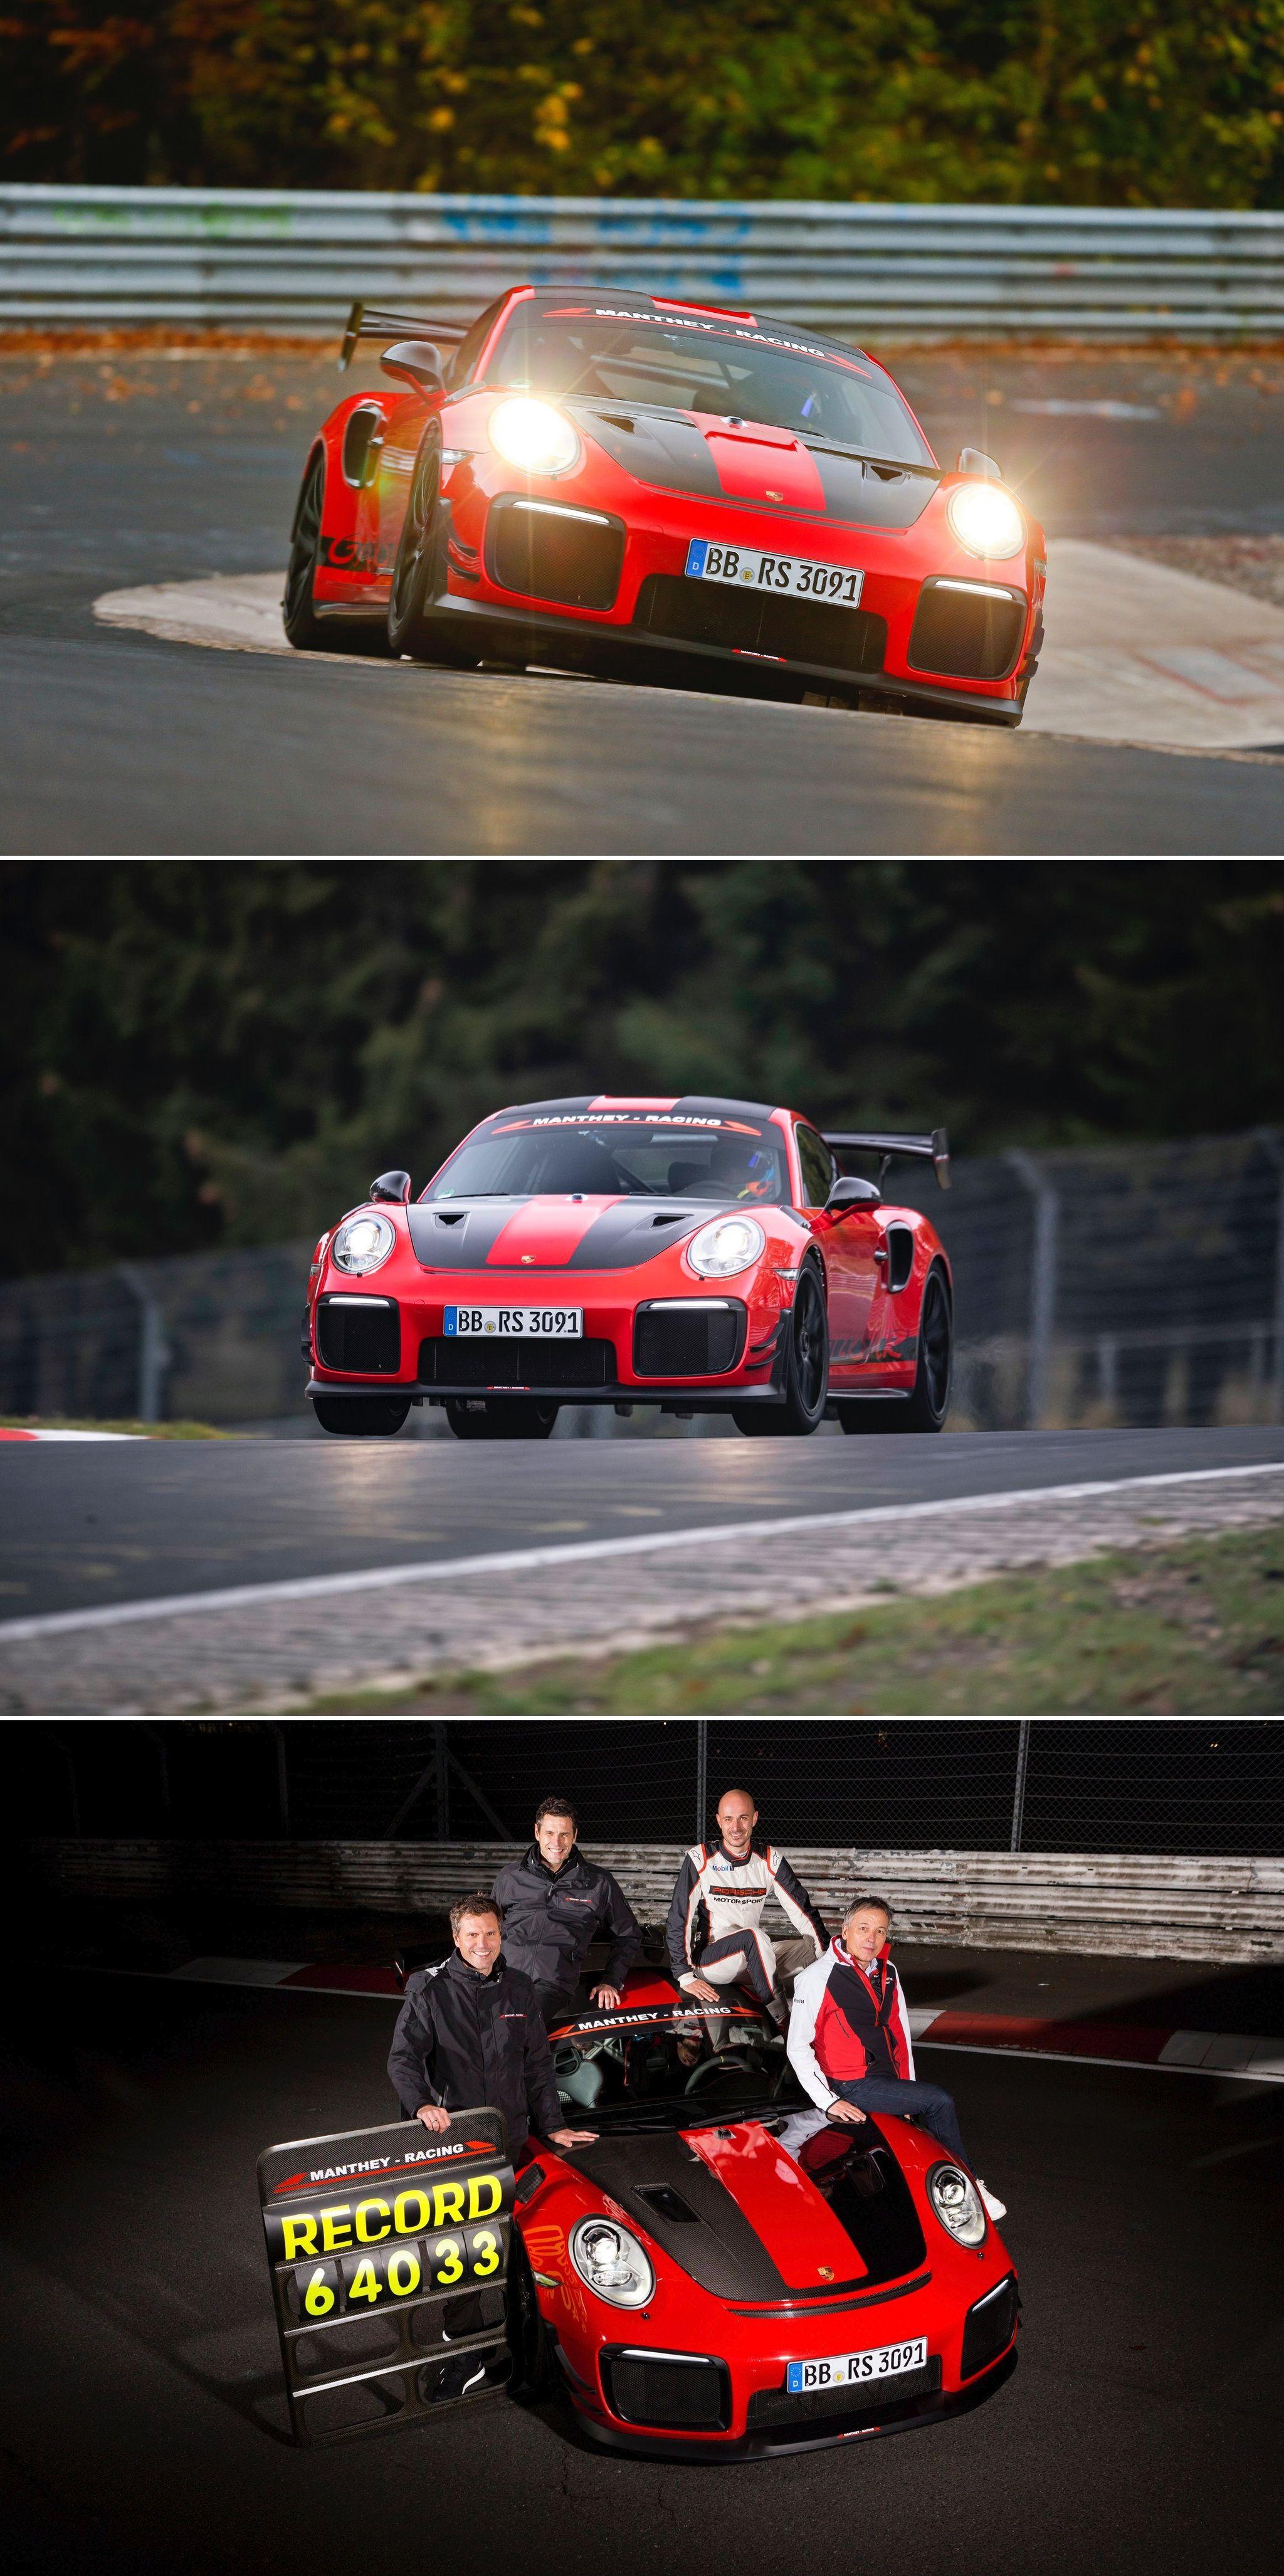 Porsche Gb Porschegb 6 40 3 Minutes The Time It S Just Taken The 700hp Porsche Gt2 Rs Mr To Lap The Nurburgring Nordschleife That Nurburgring Nordschleife